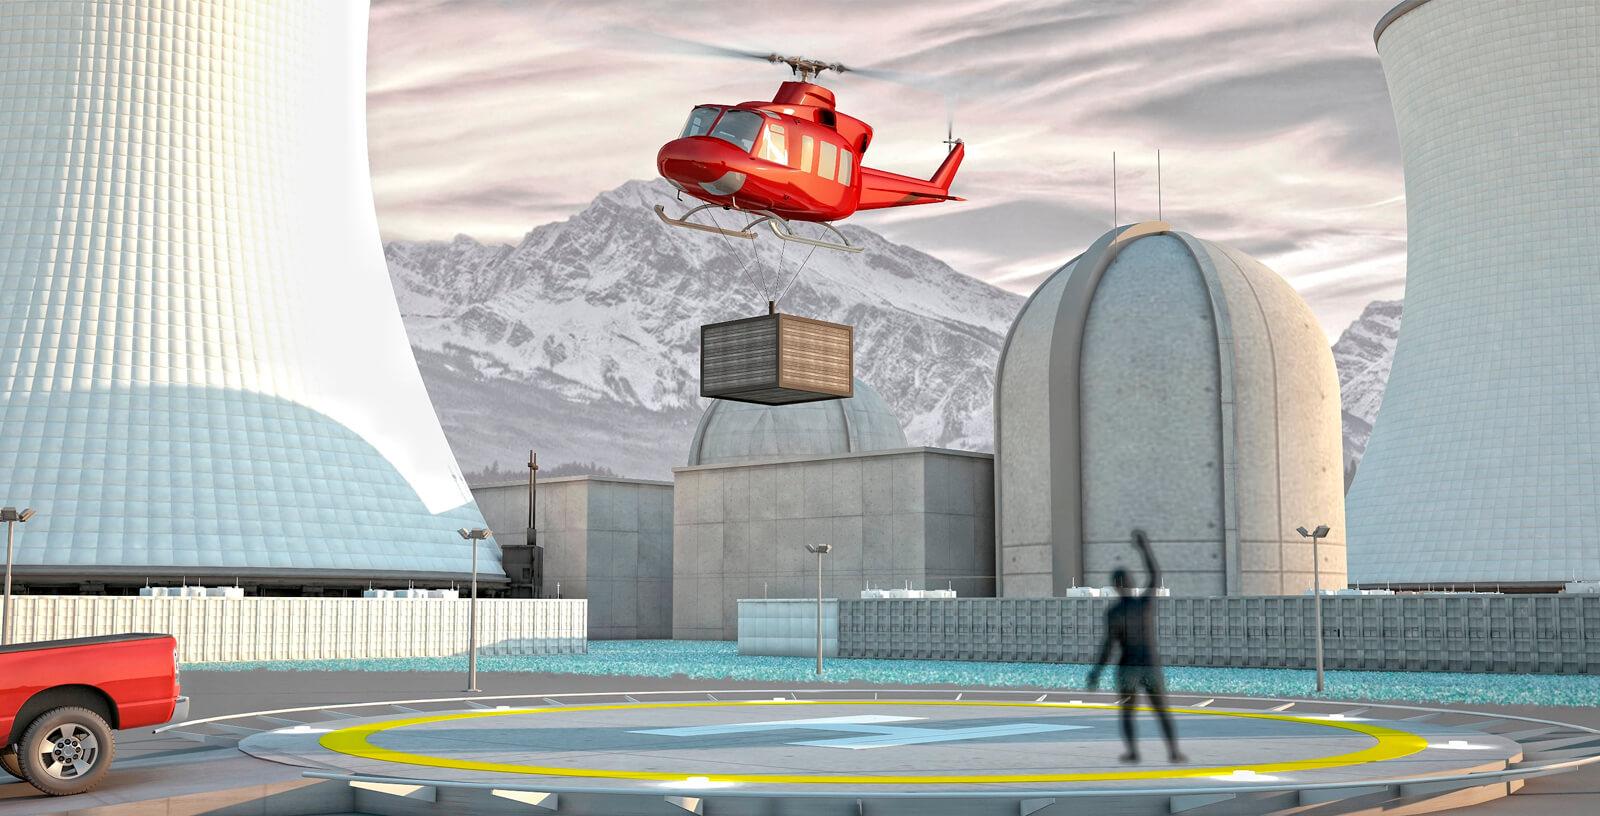 Idom_Nuclear_Services_CNAT_Feasibility_studies_design_homologated_heliports_Almaraz_Trillo_nuclear_power_plants_I_igo_Gutierrez